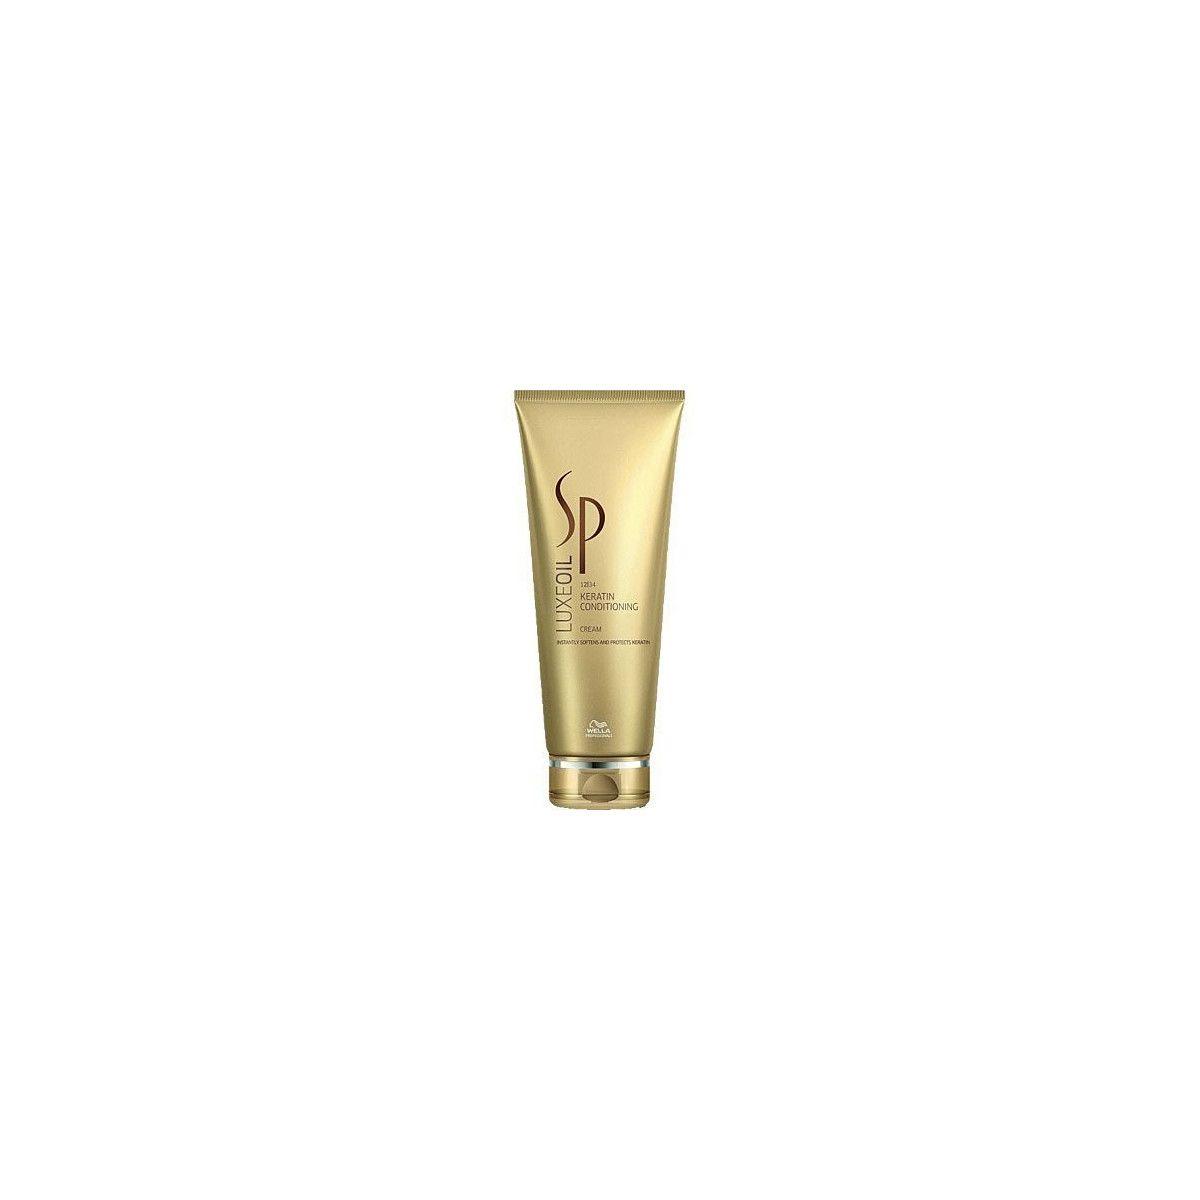 WELLA SP LUXE OIL szampon 200ml